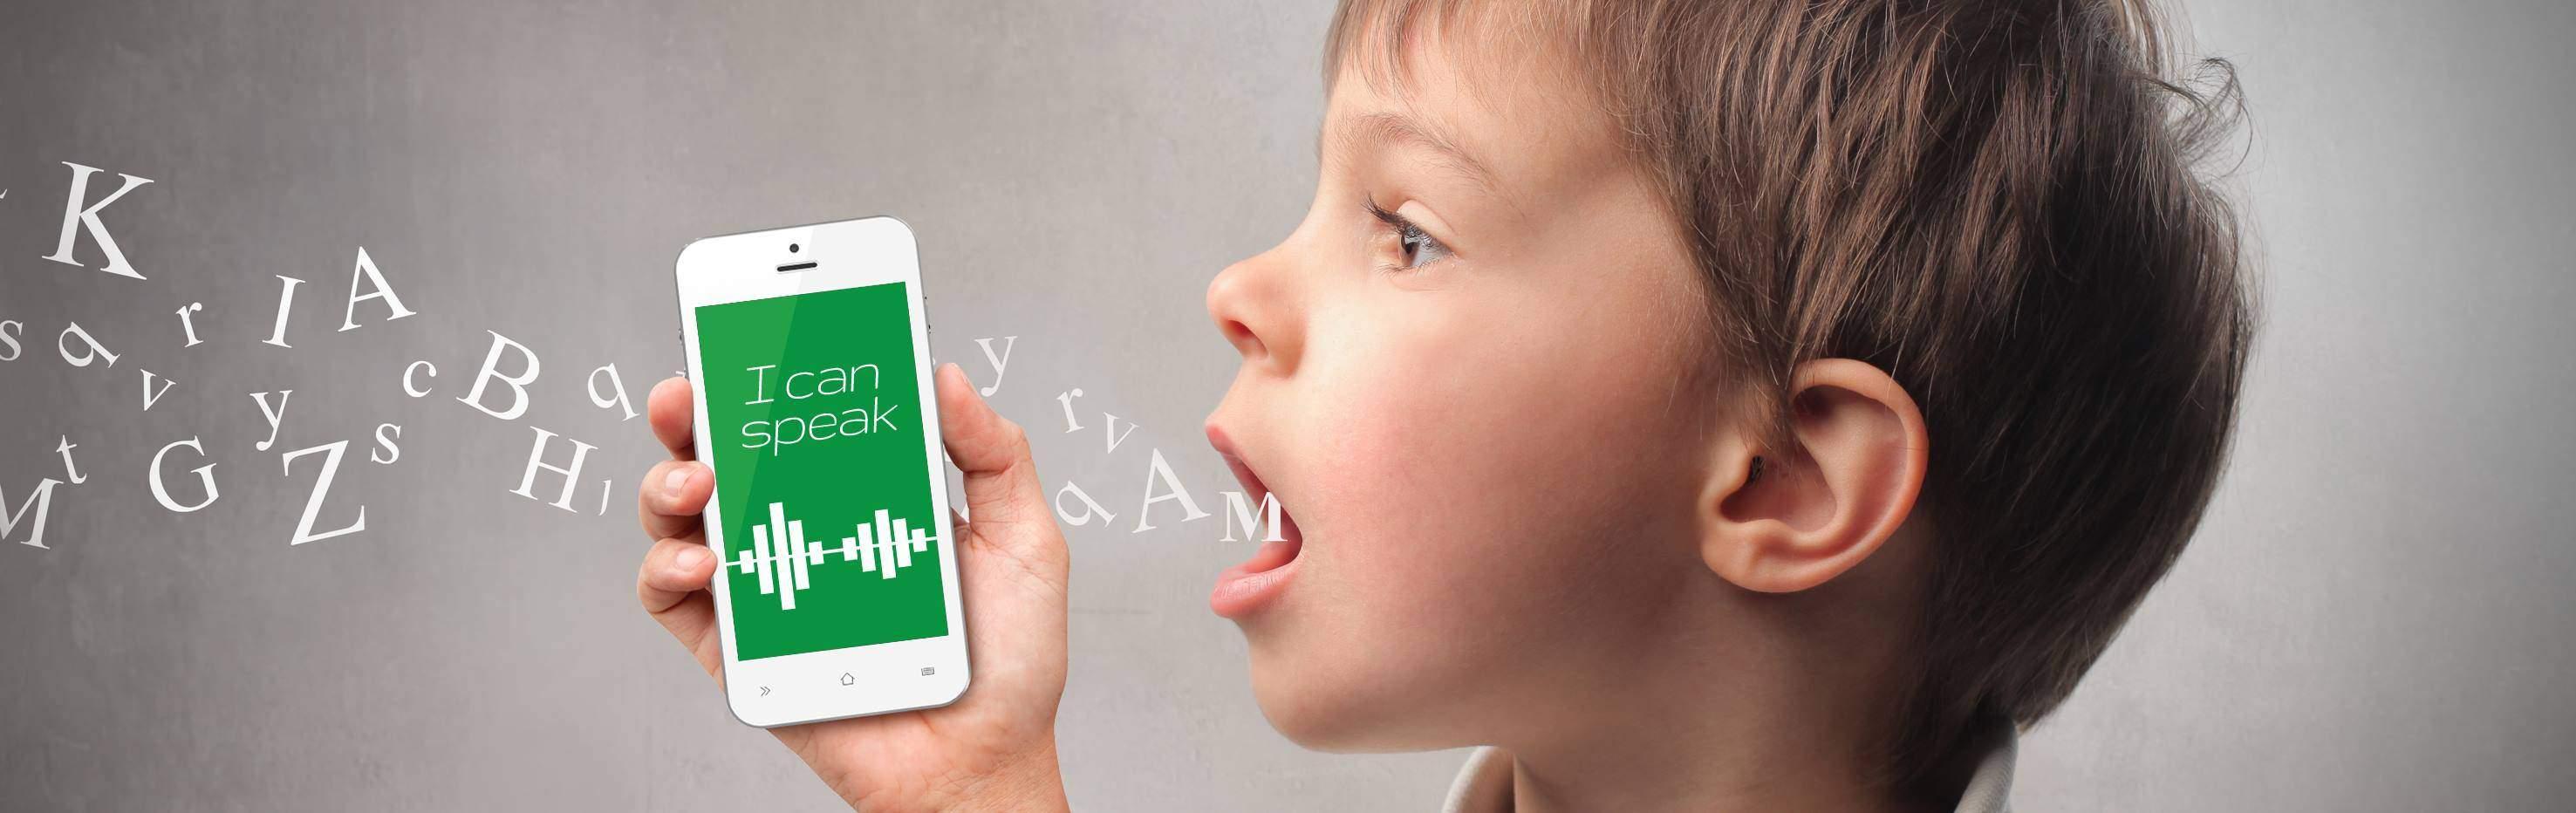 Talk Iit aplikácia